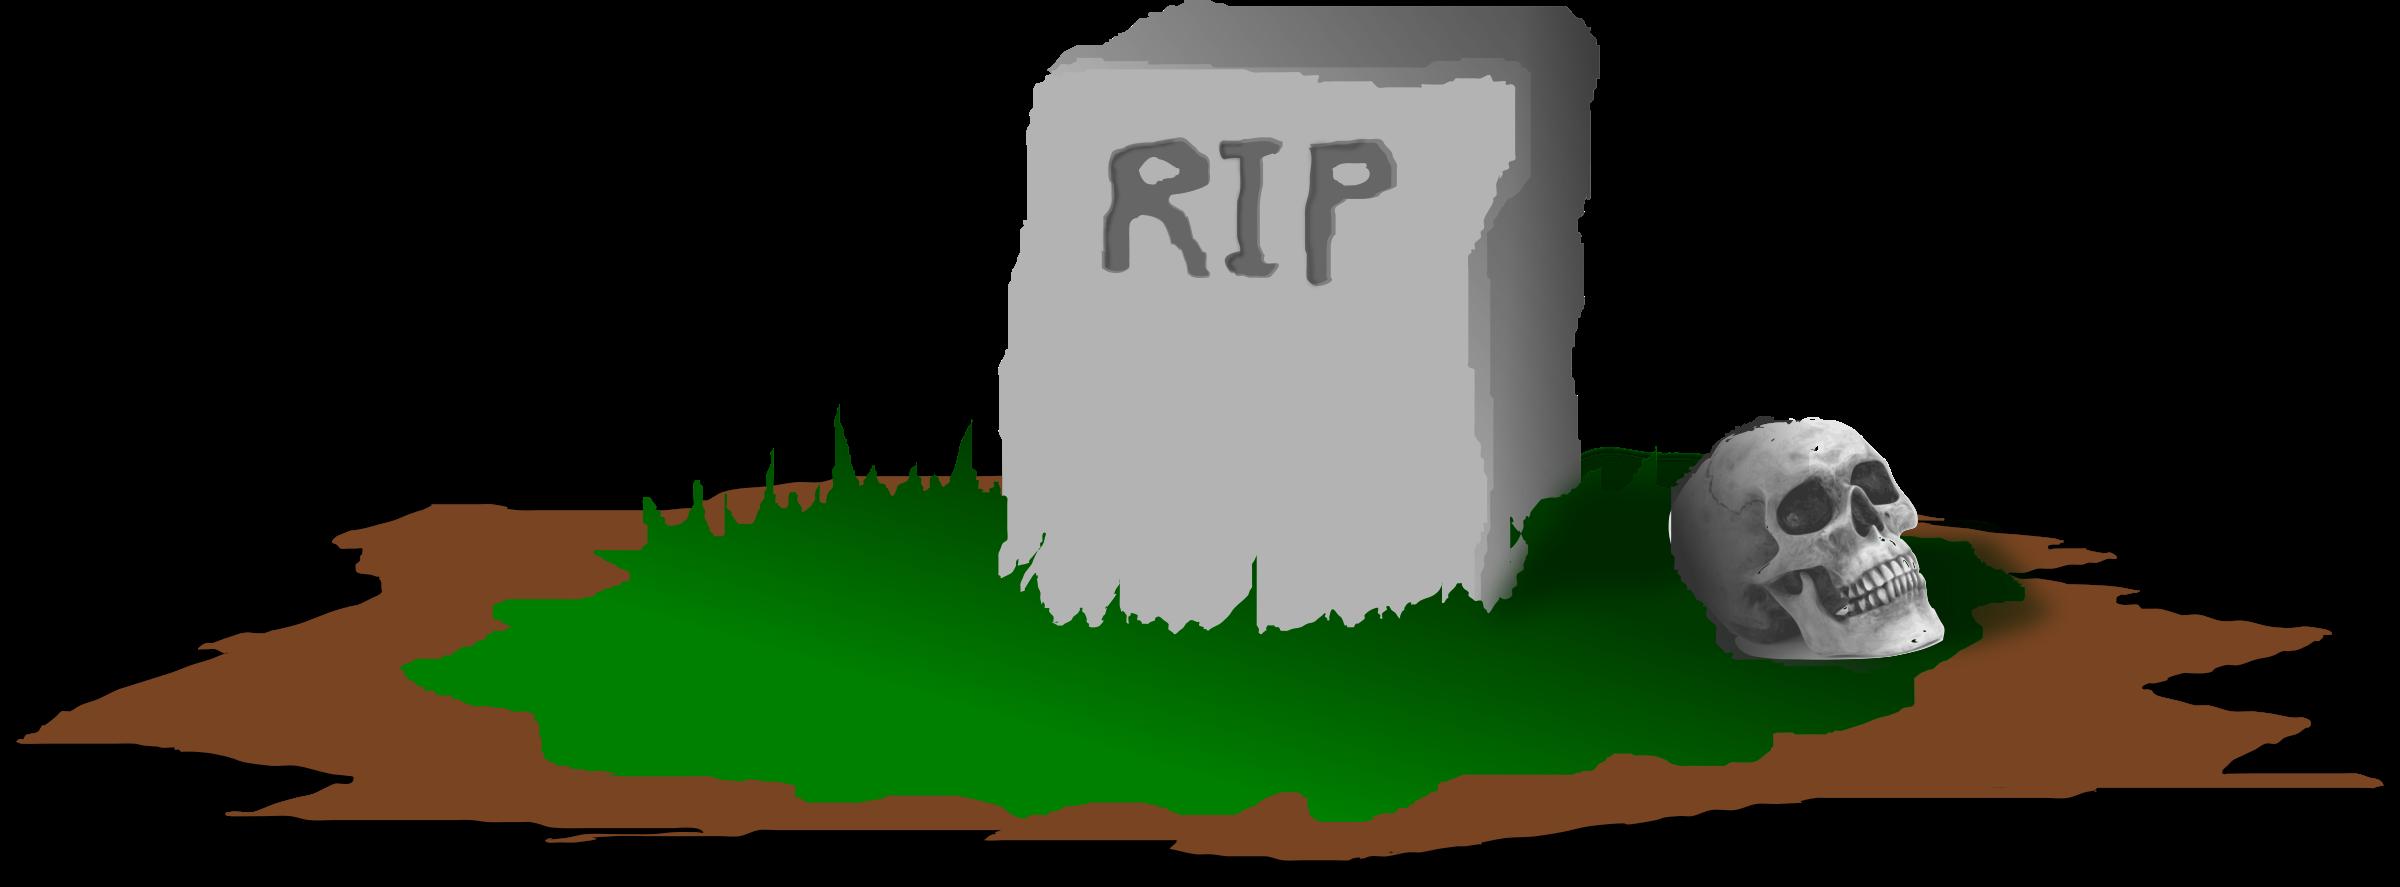 Gravestone PNG Image